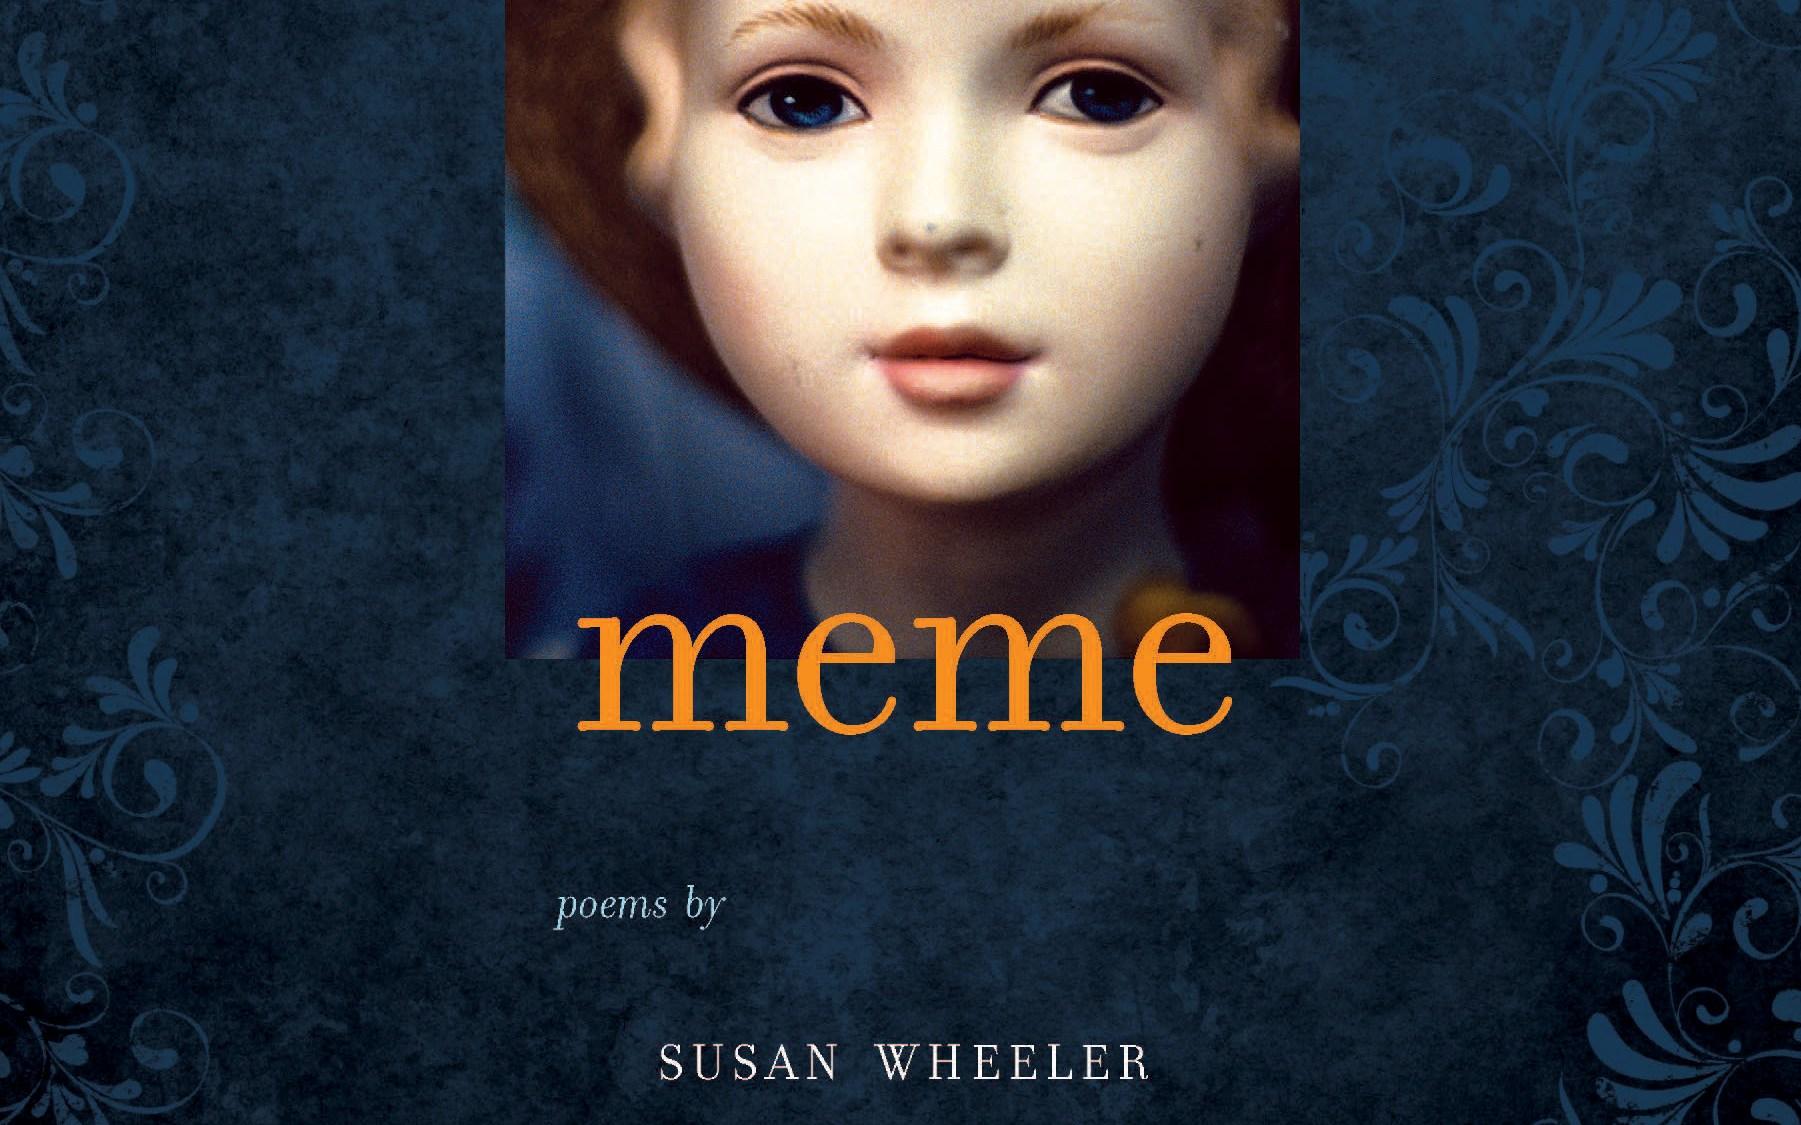 Meme by Susan Wheeler